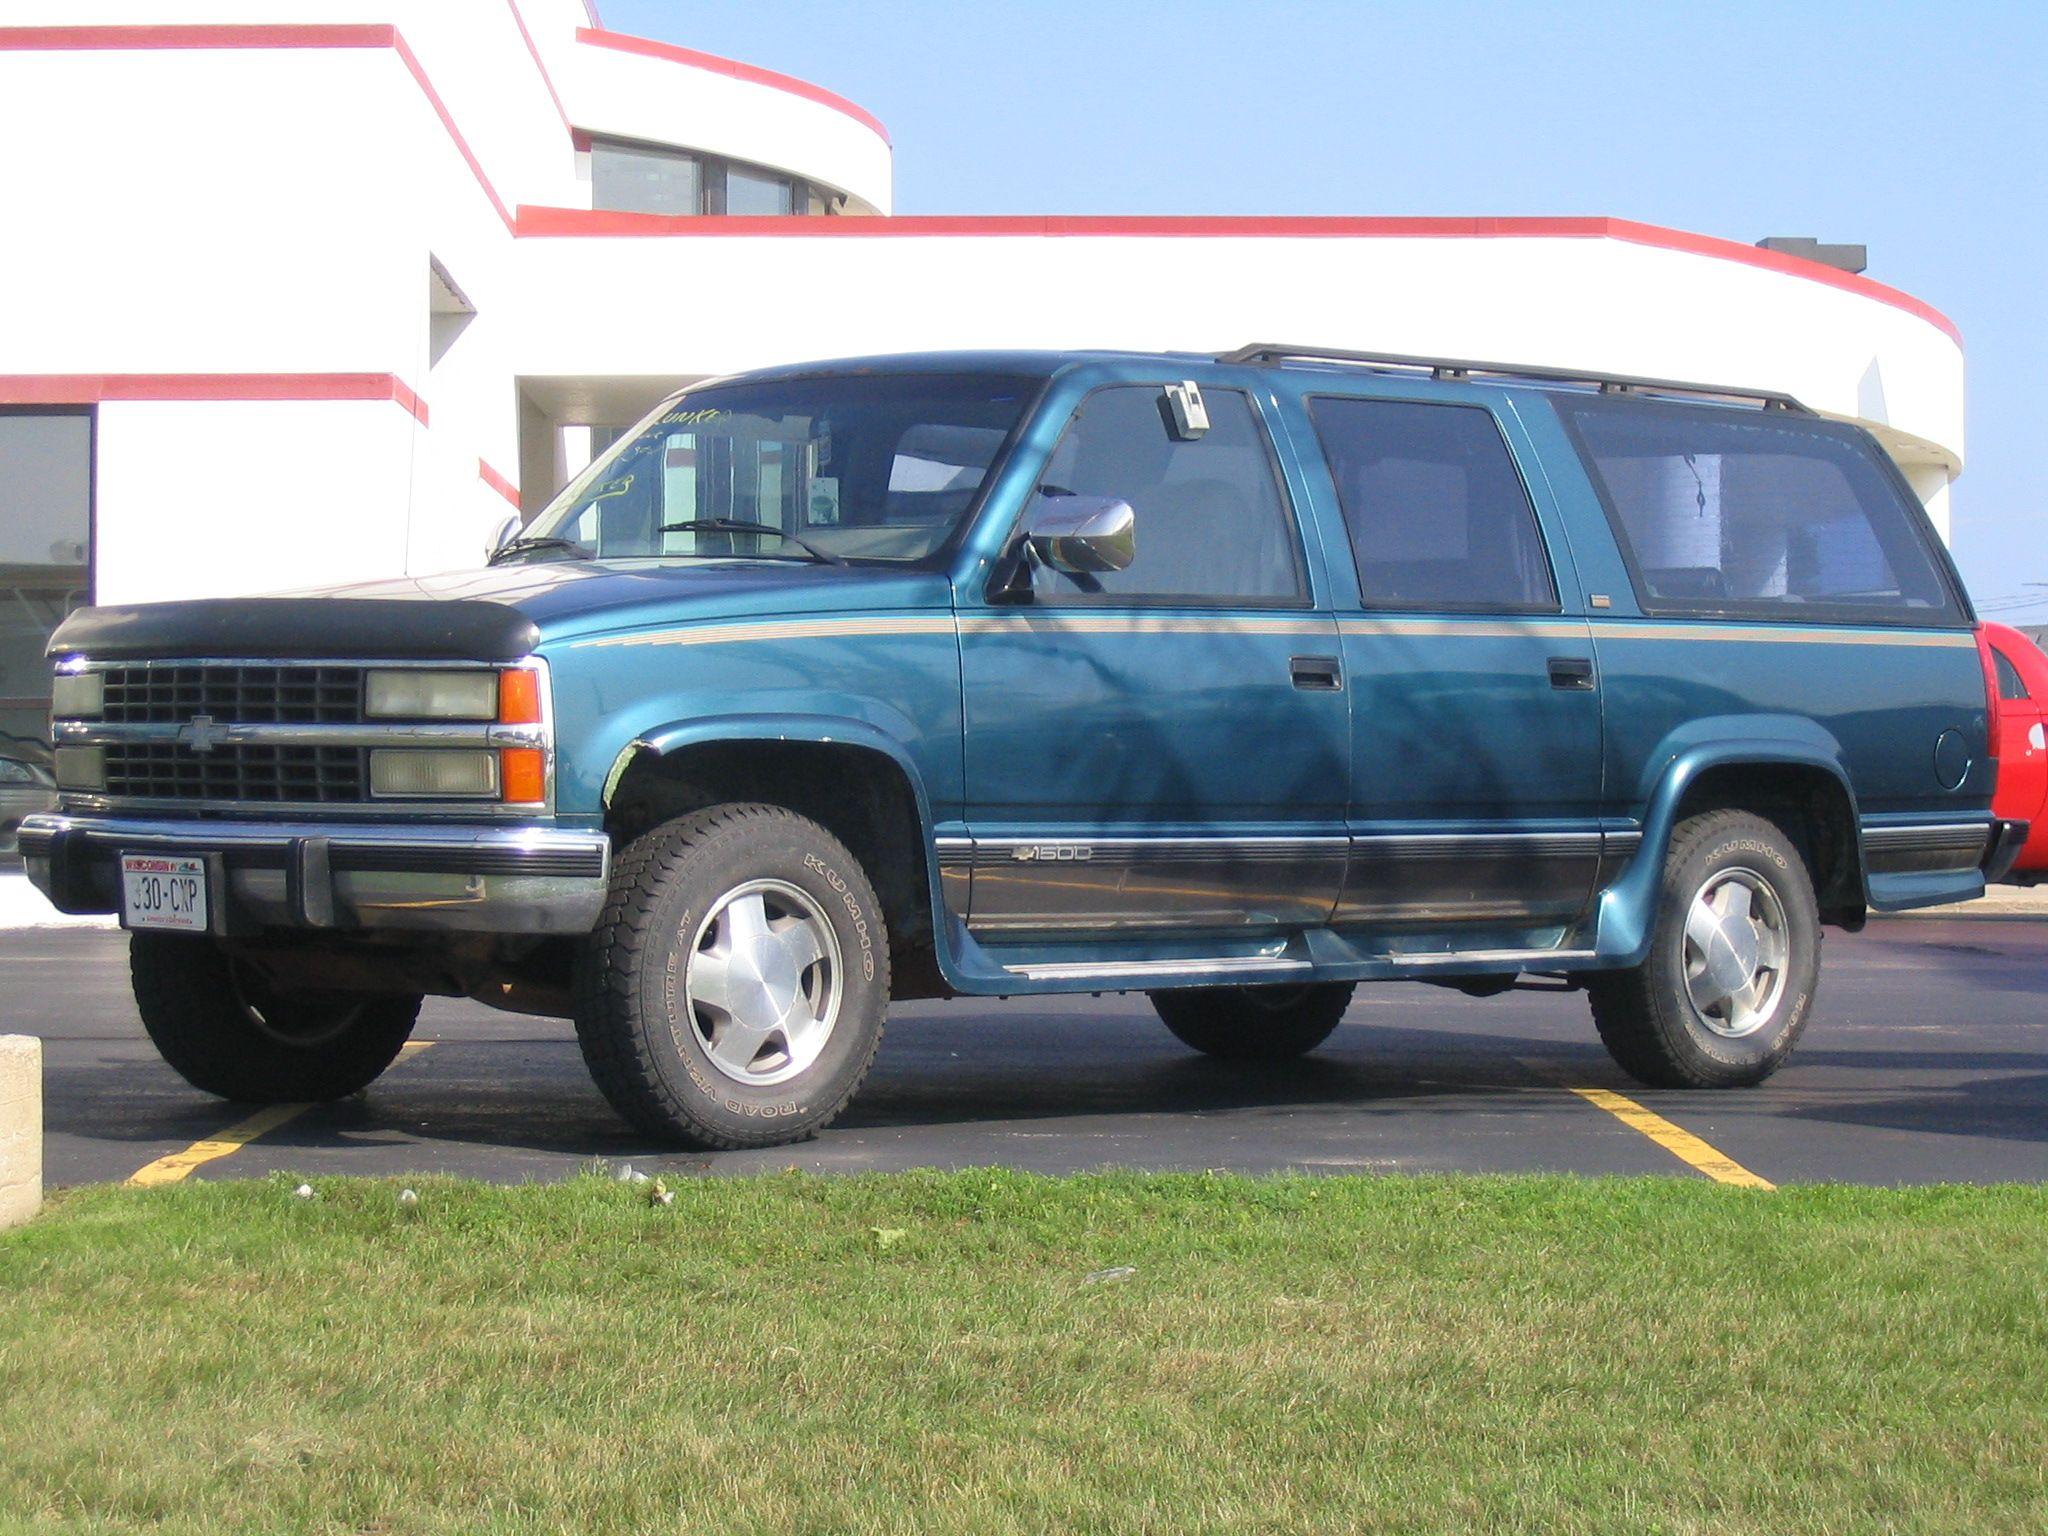 1993 chevrolet suburban blue google search